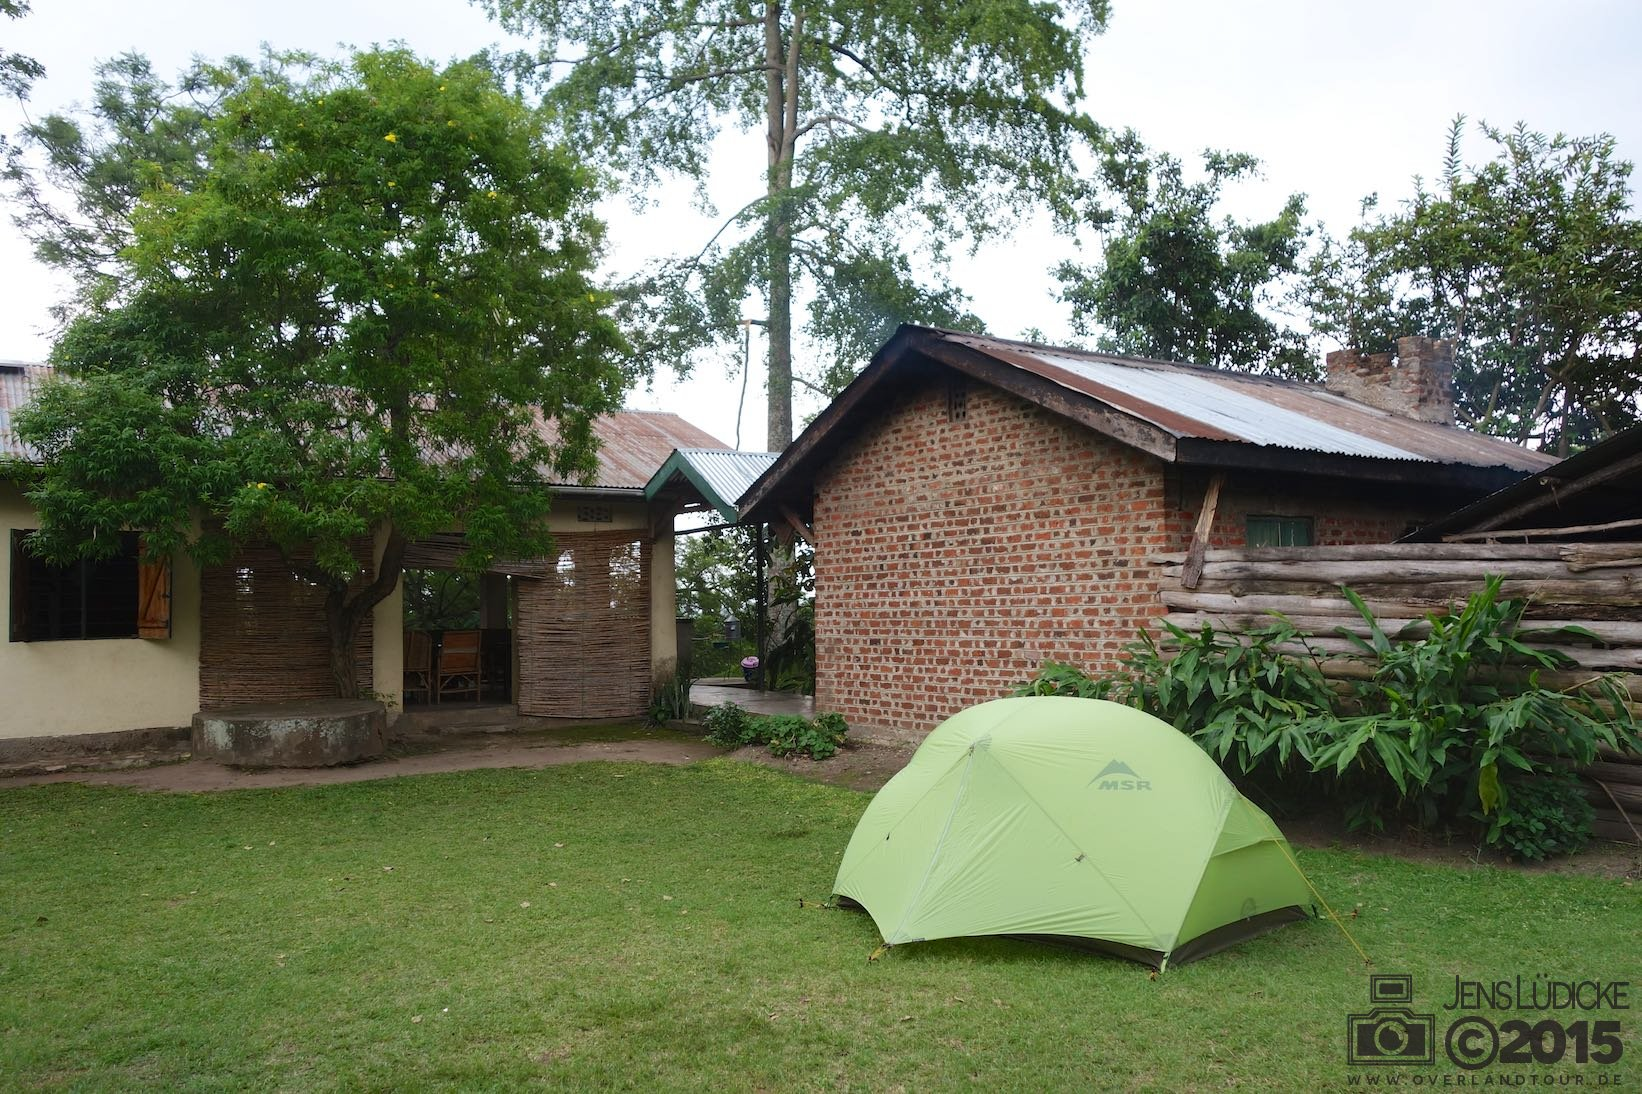 Zelten beim Lake Nkuruba Nature Reserve